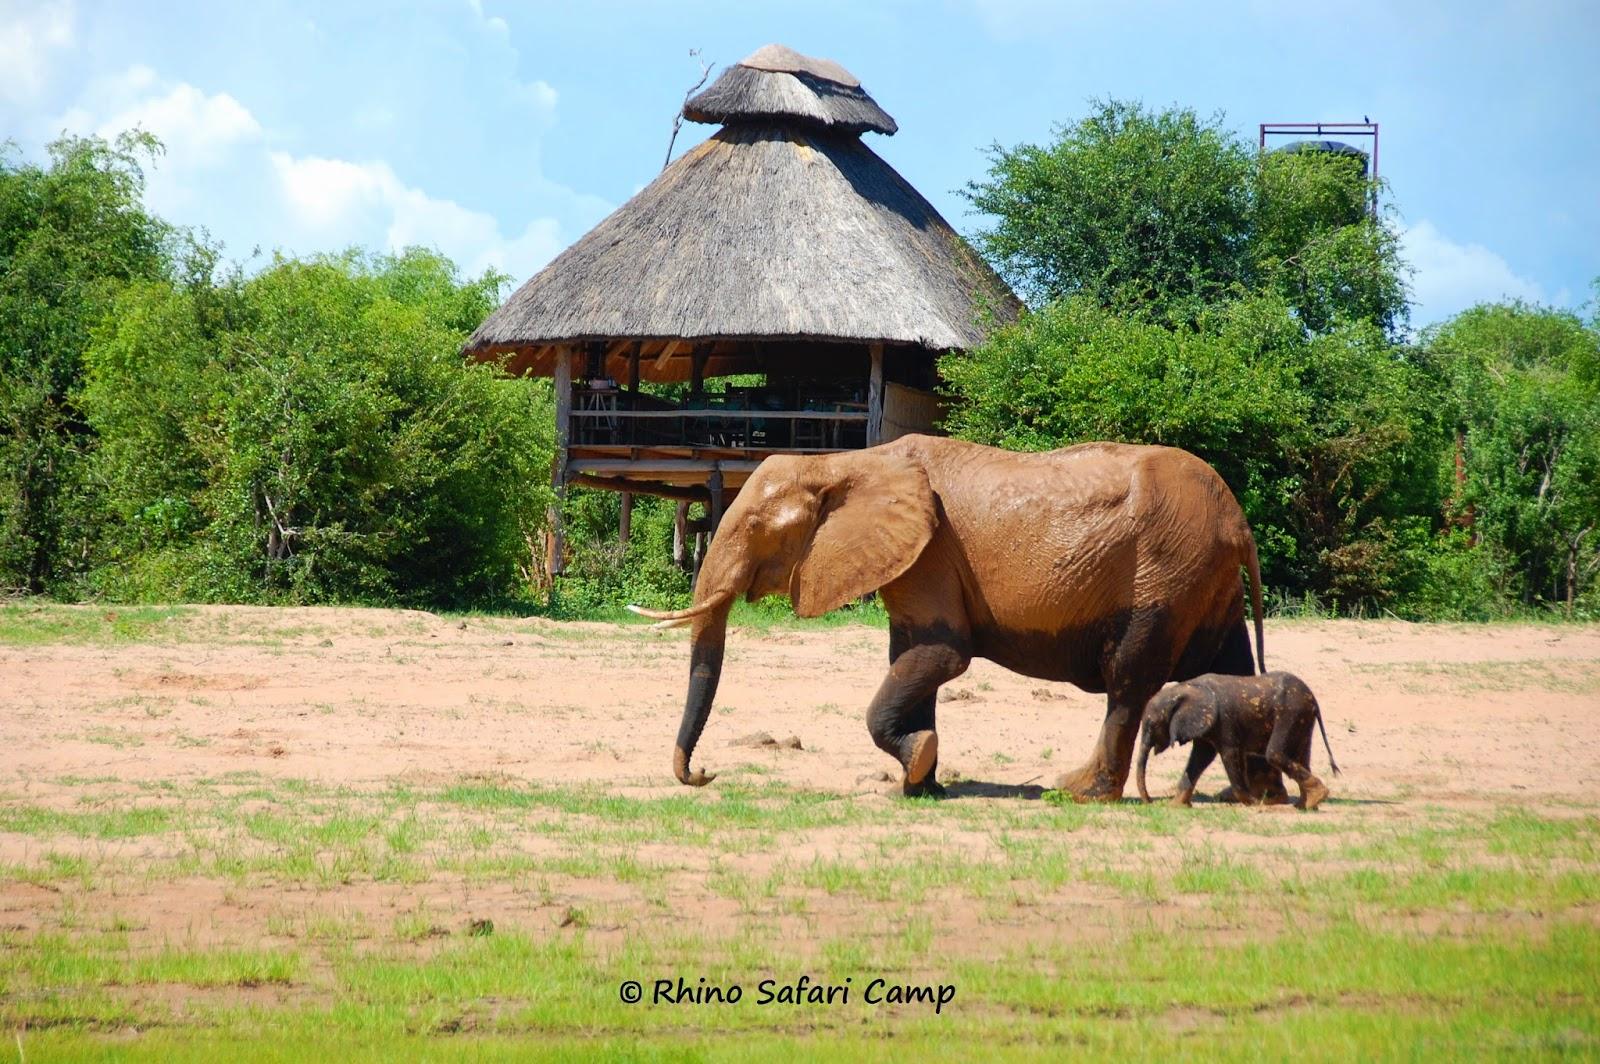 Rhino Safari Camp - Matusadona National Park - Lake Kariba, Zimbabwe